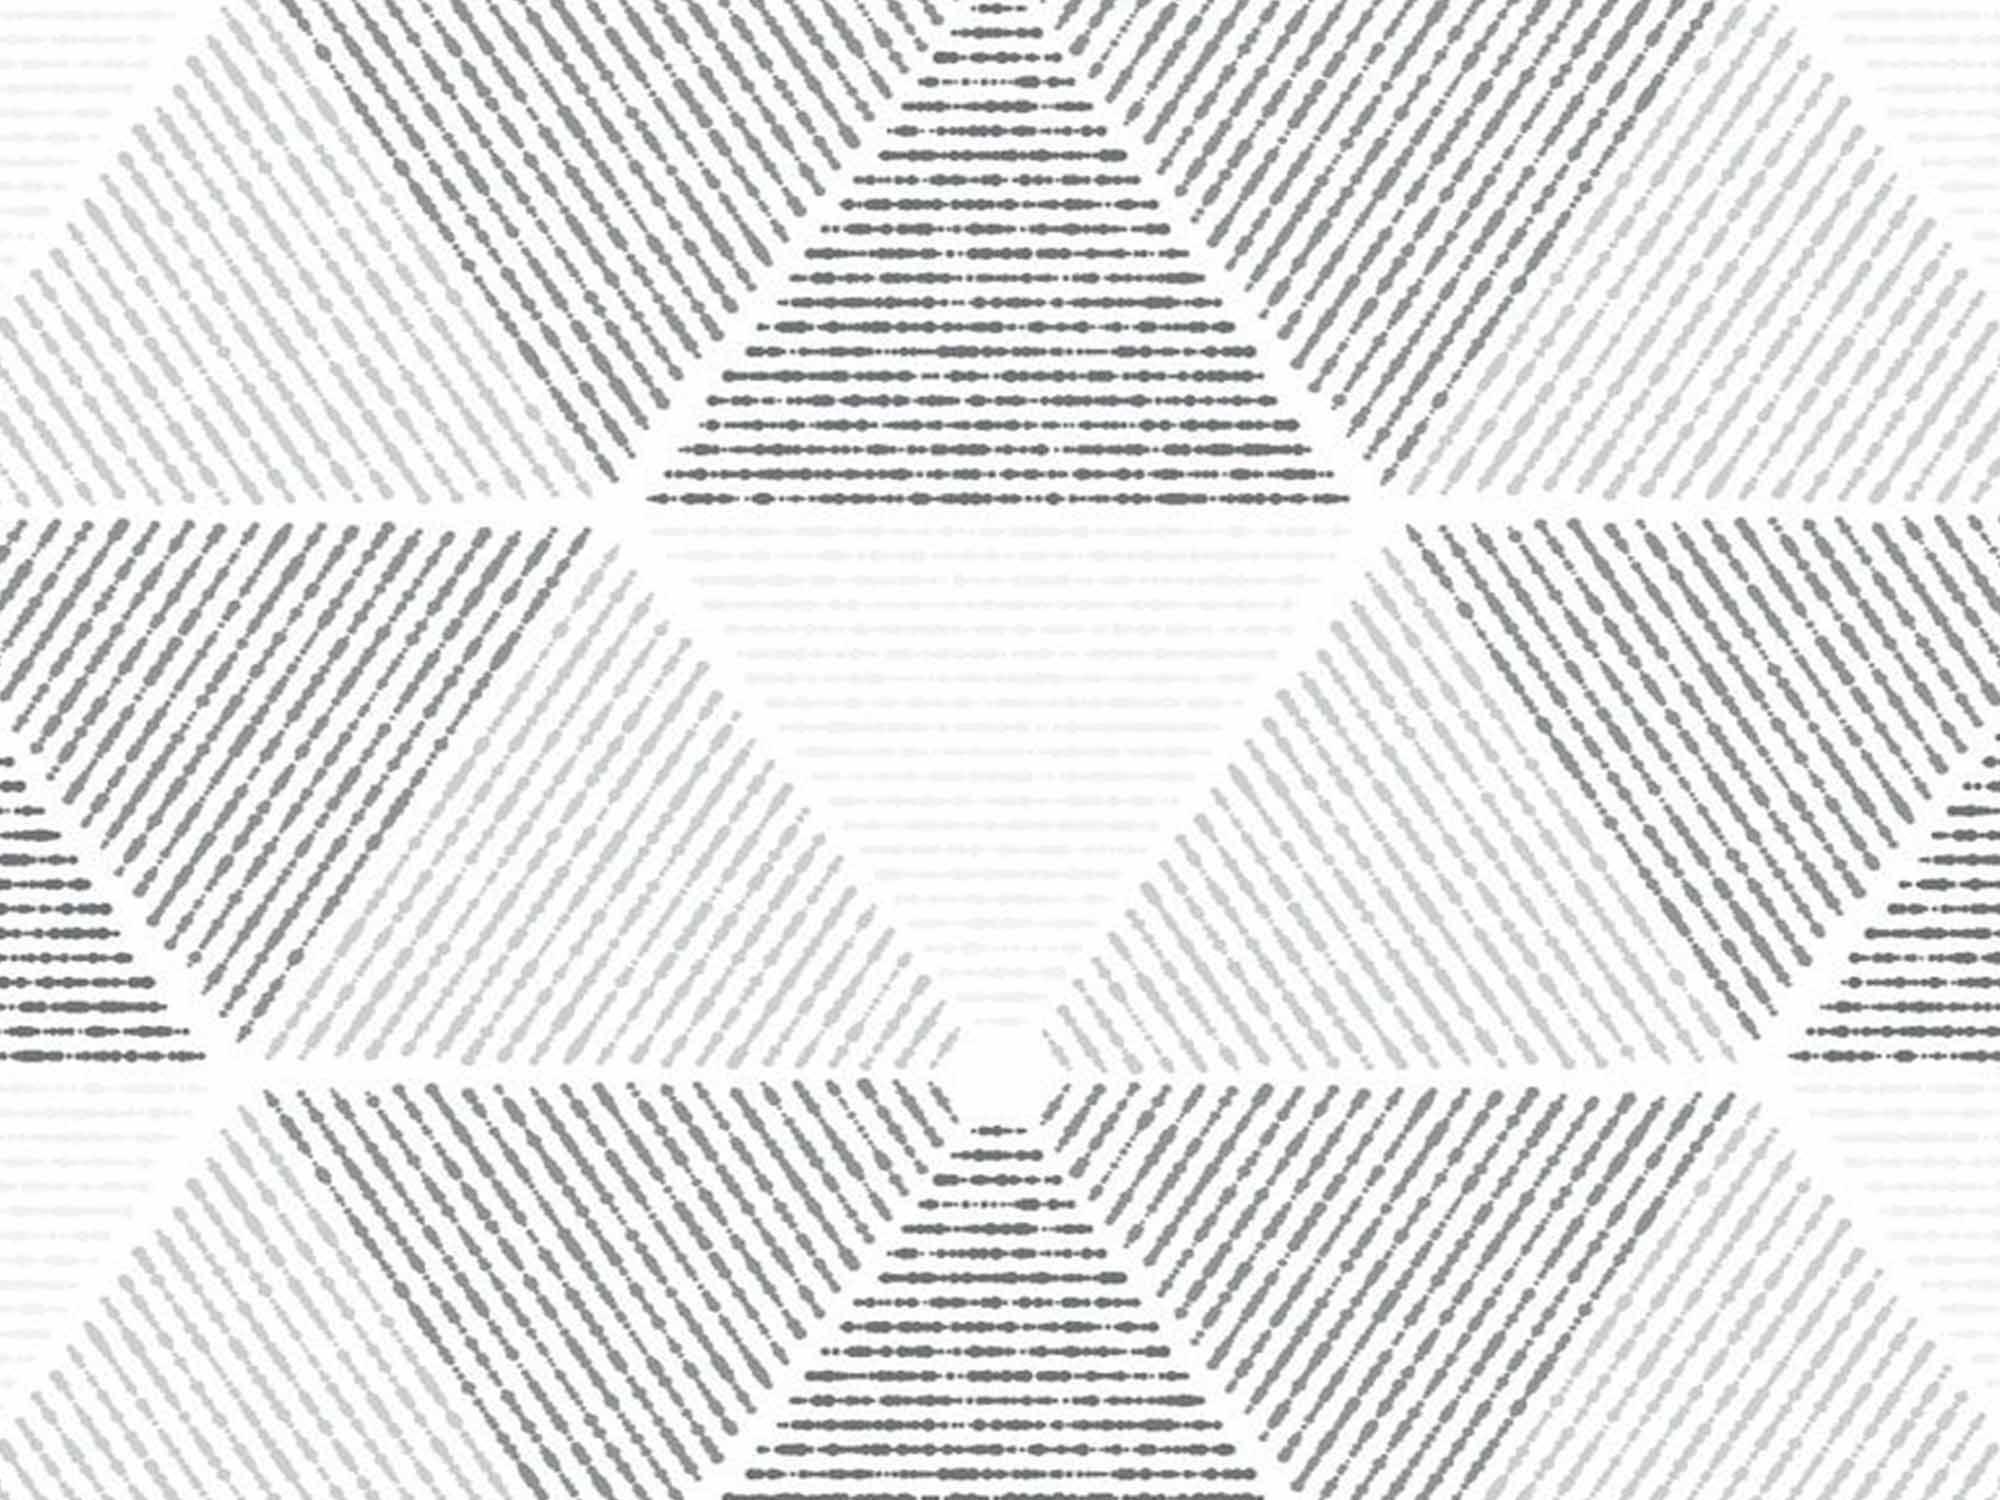 Papel de Parede para Sala Geométrico 0038 - Adesivos de Parede  - Paredes Decoradas